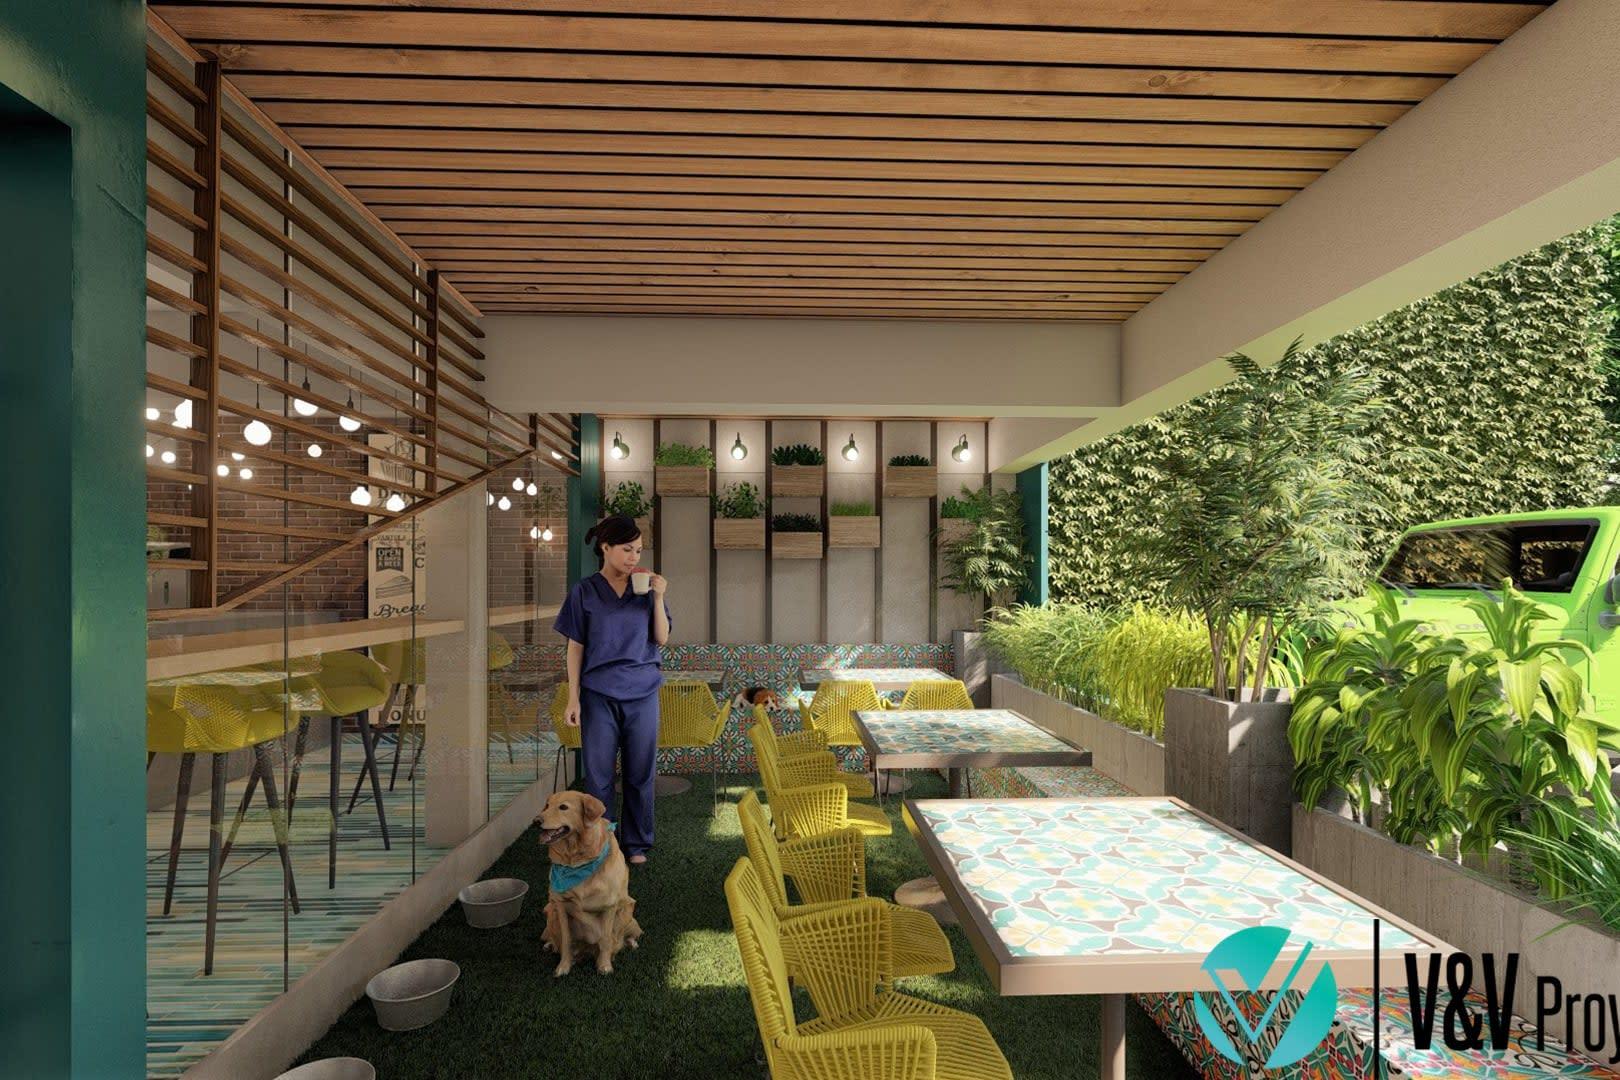 Portfolio for Architecture, interior design and 3d mod